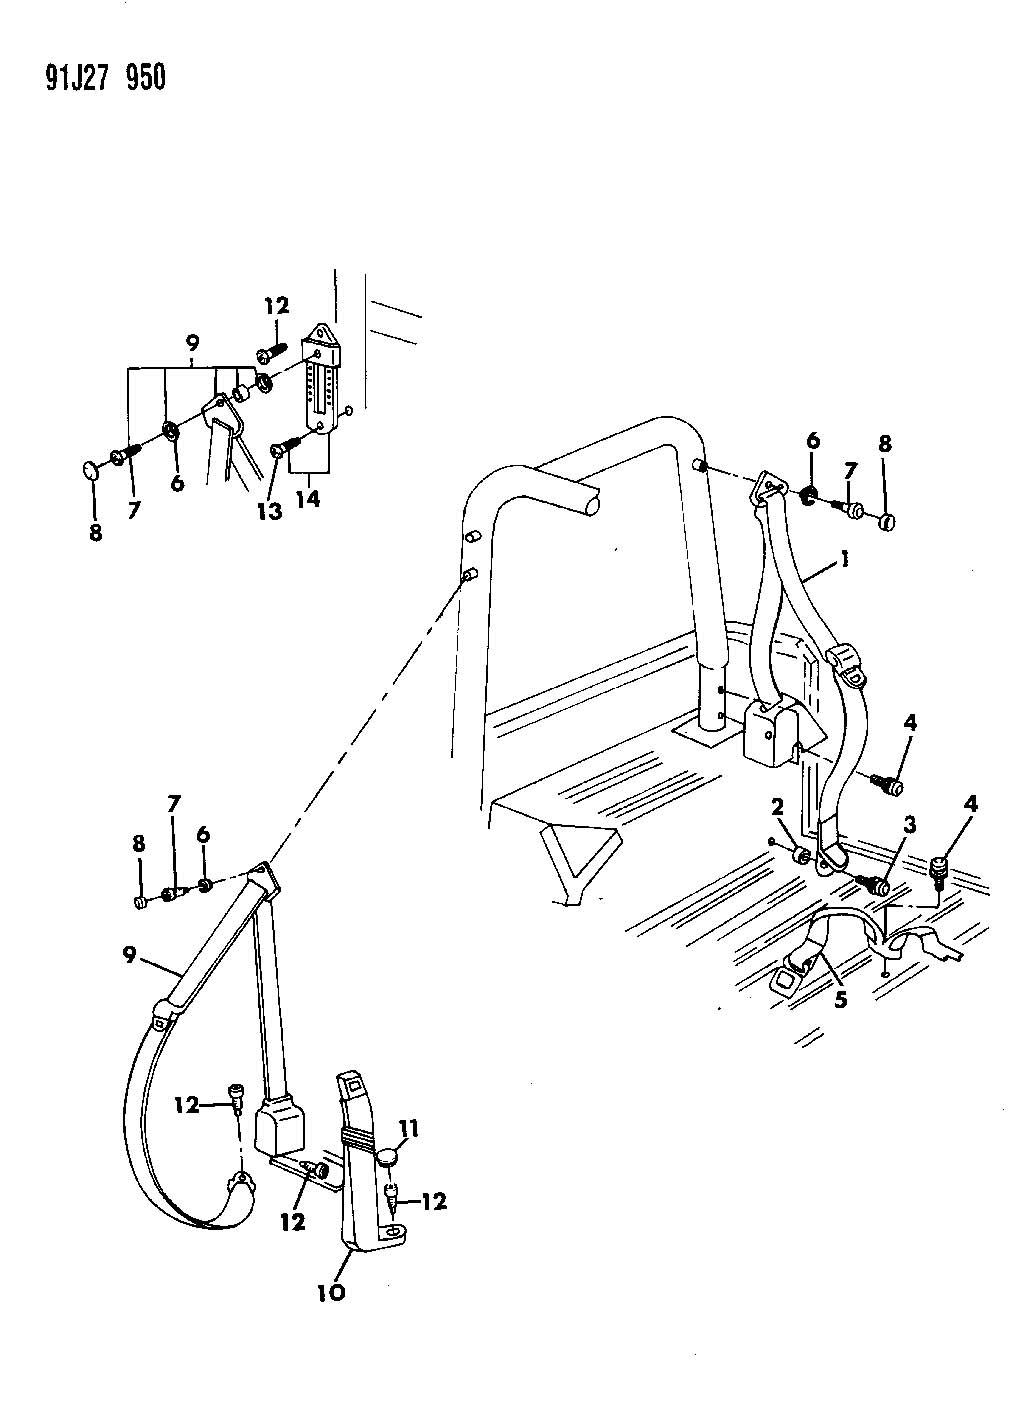 Mercedes C350 Fuse Box Diagram. Mercedes. Auto Wiring Diagram